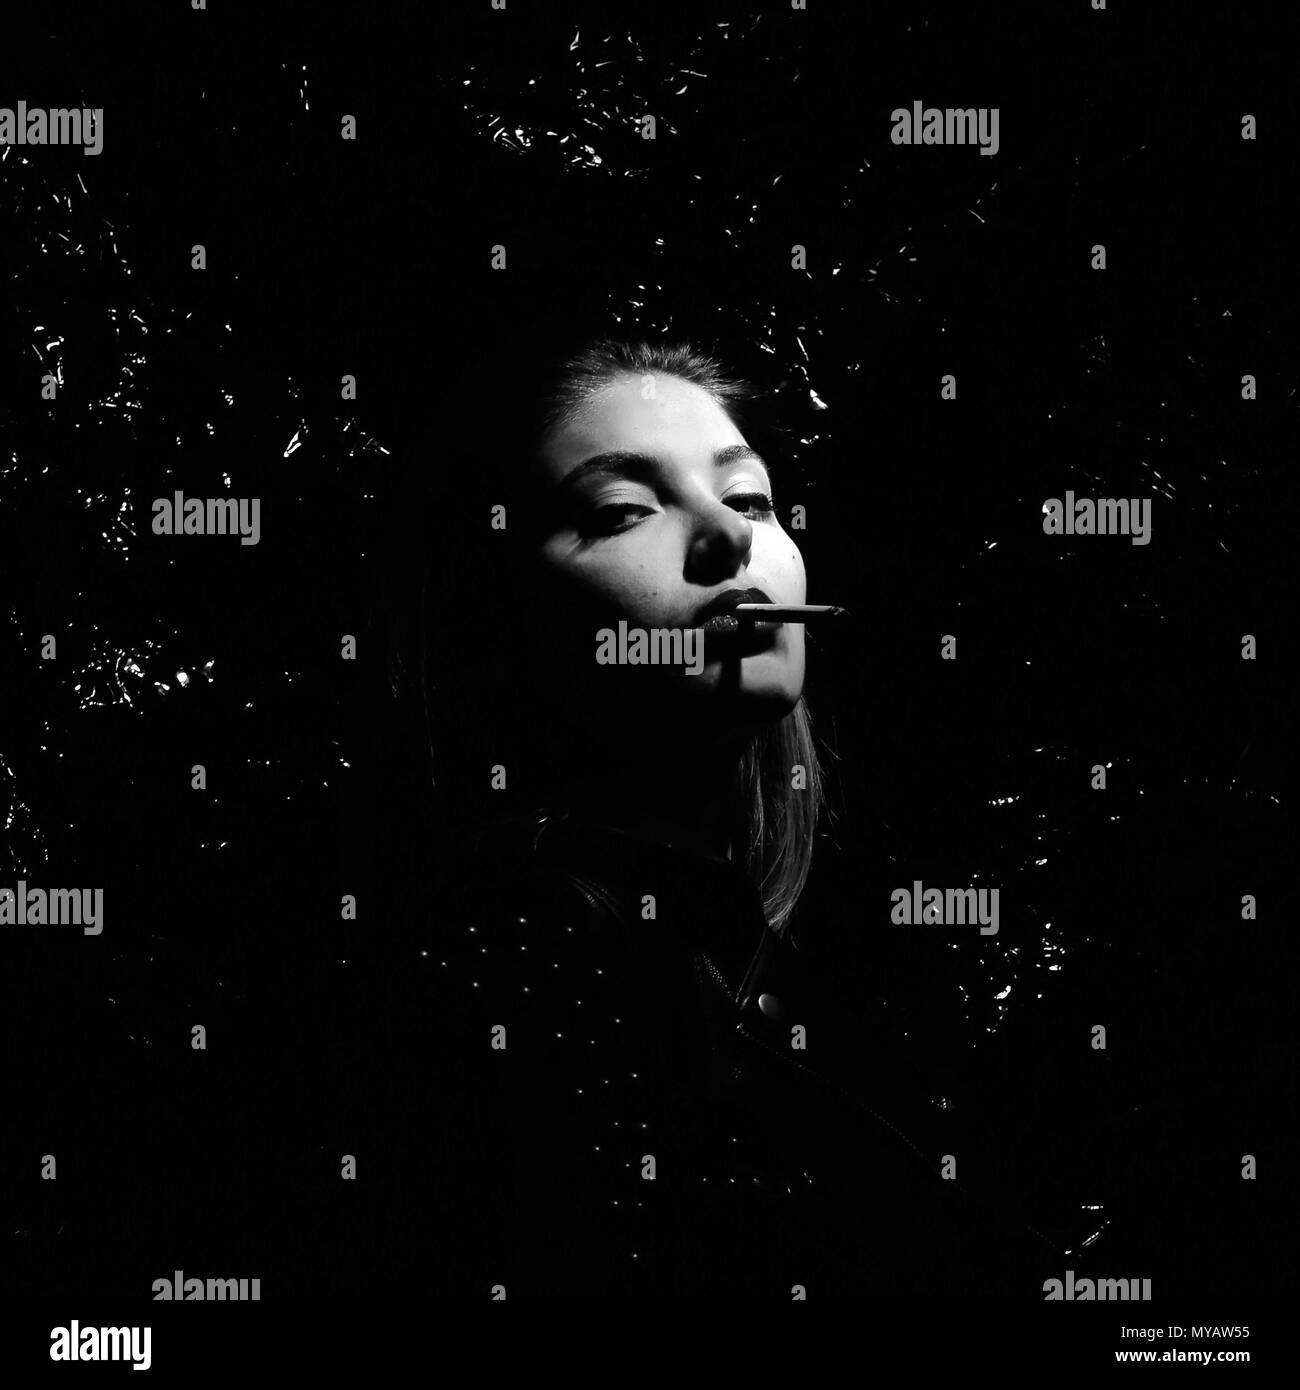 Black and White Smoking Woman - Stock Image